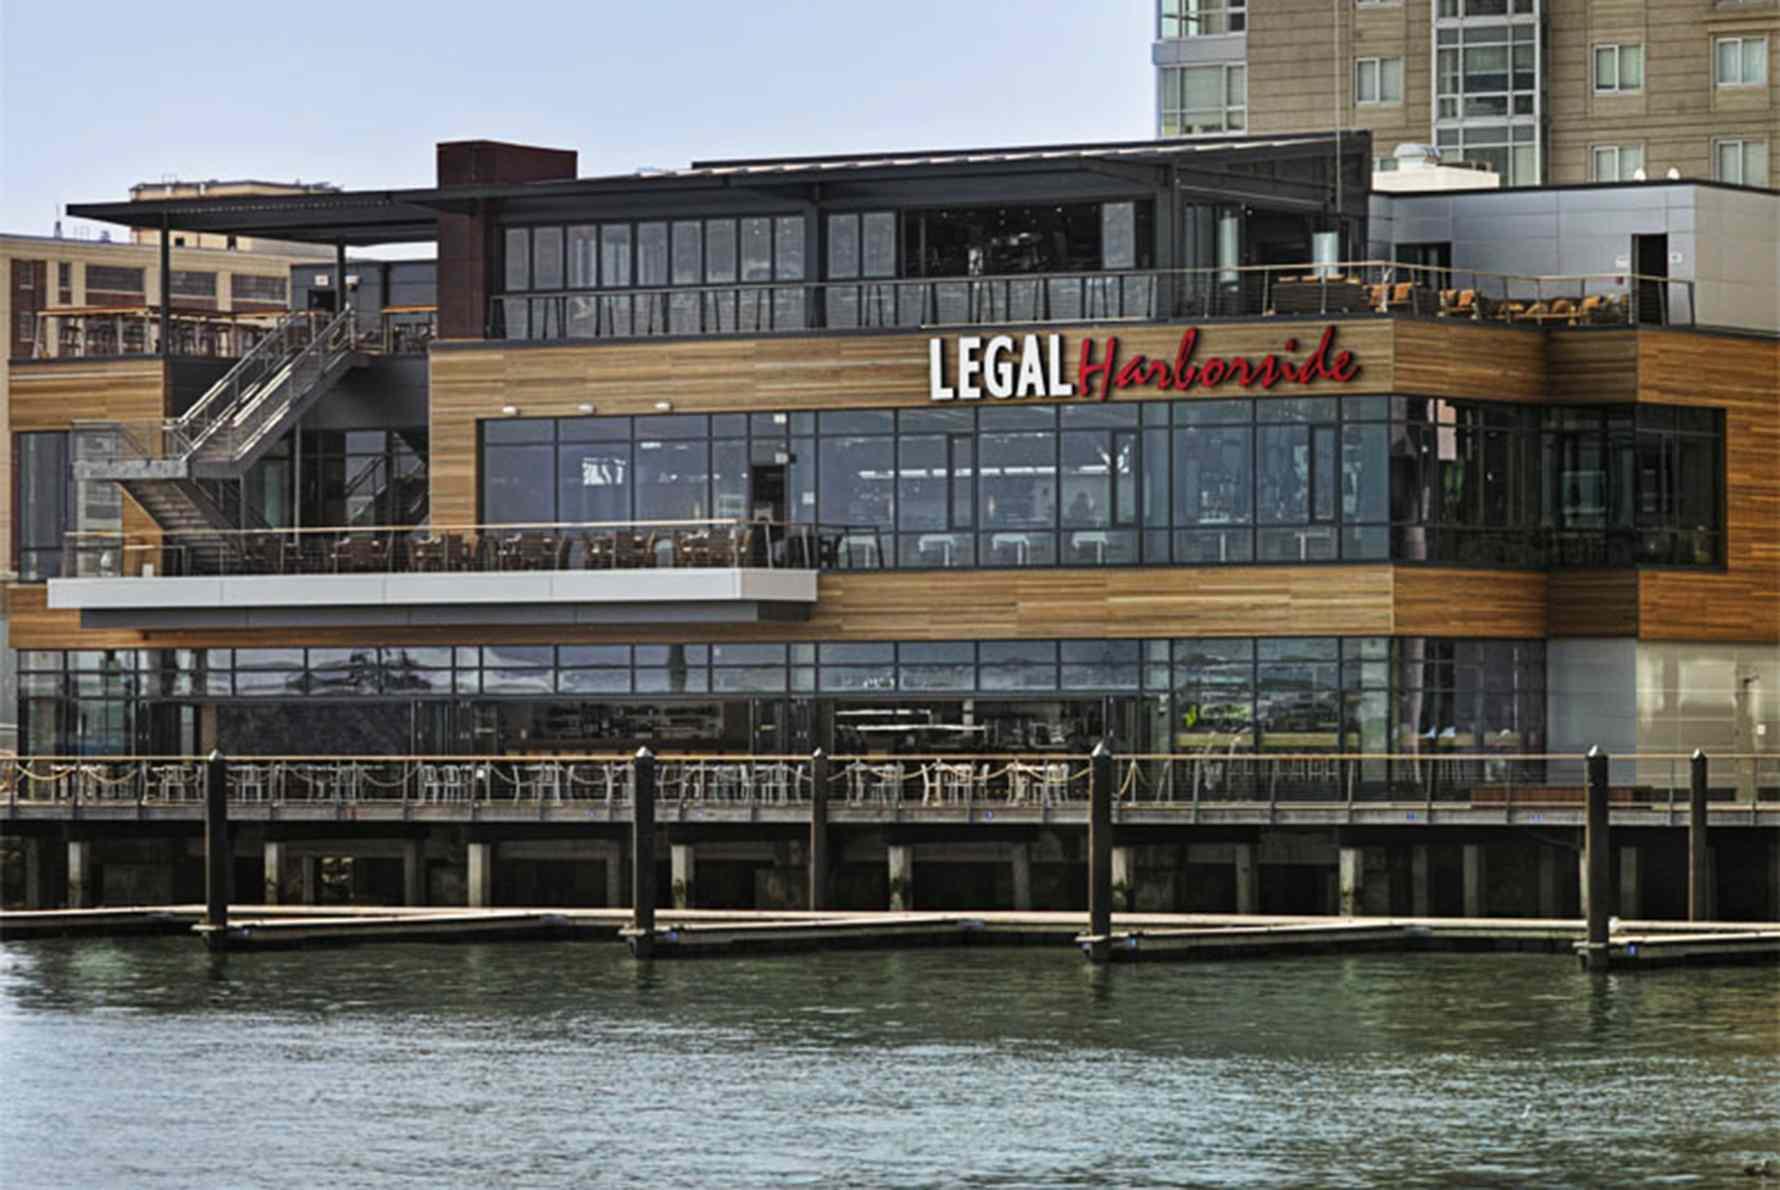 Exterior of Legal Harborside